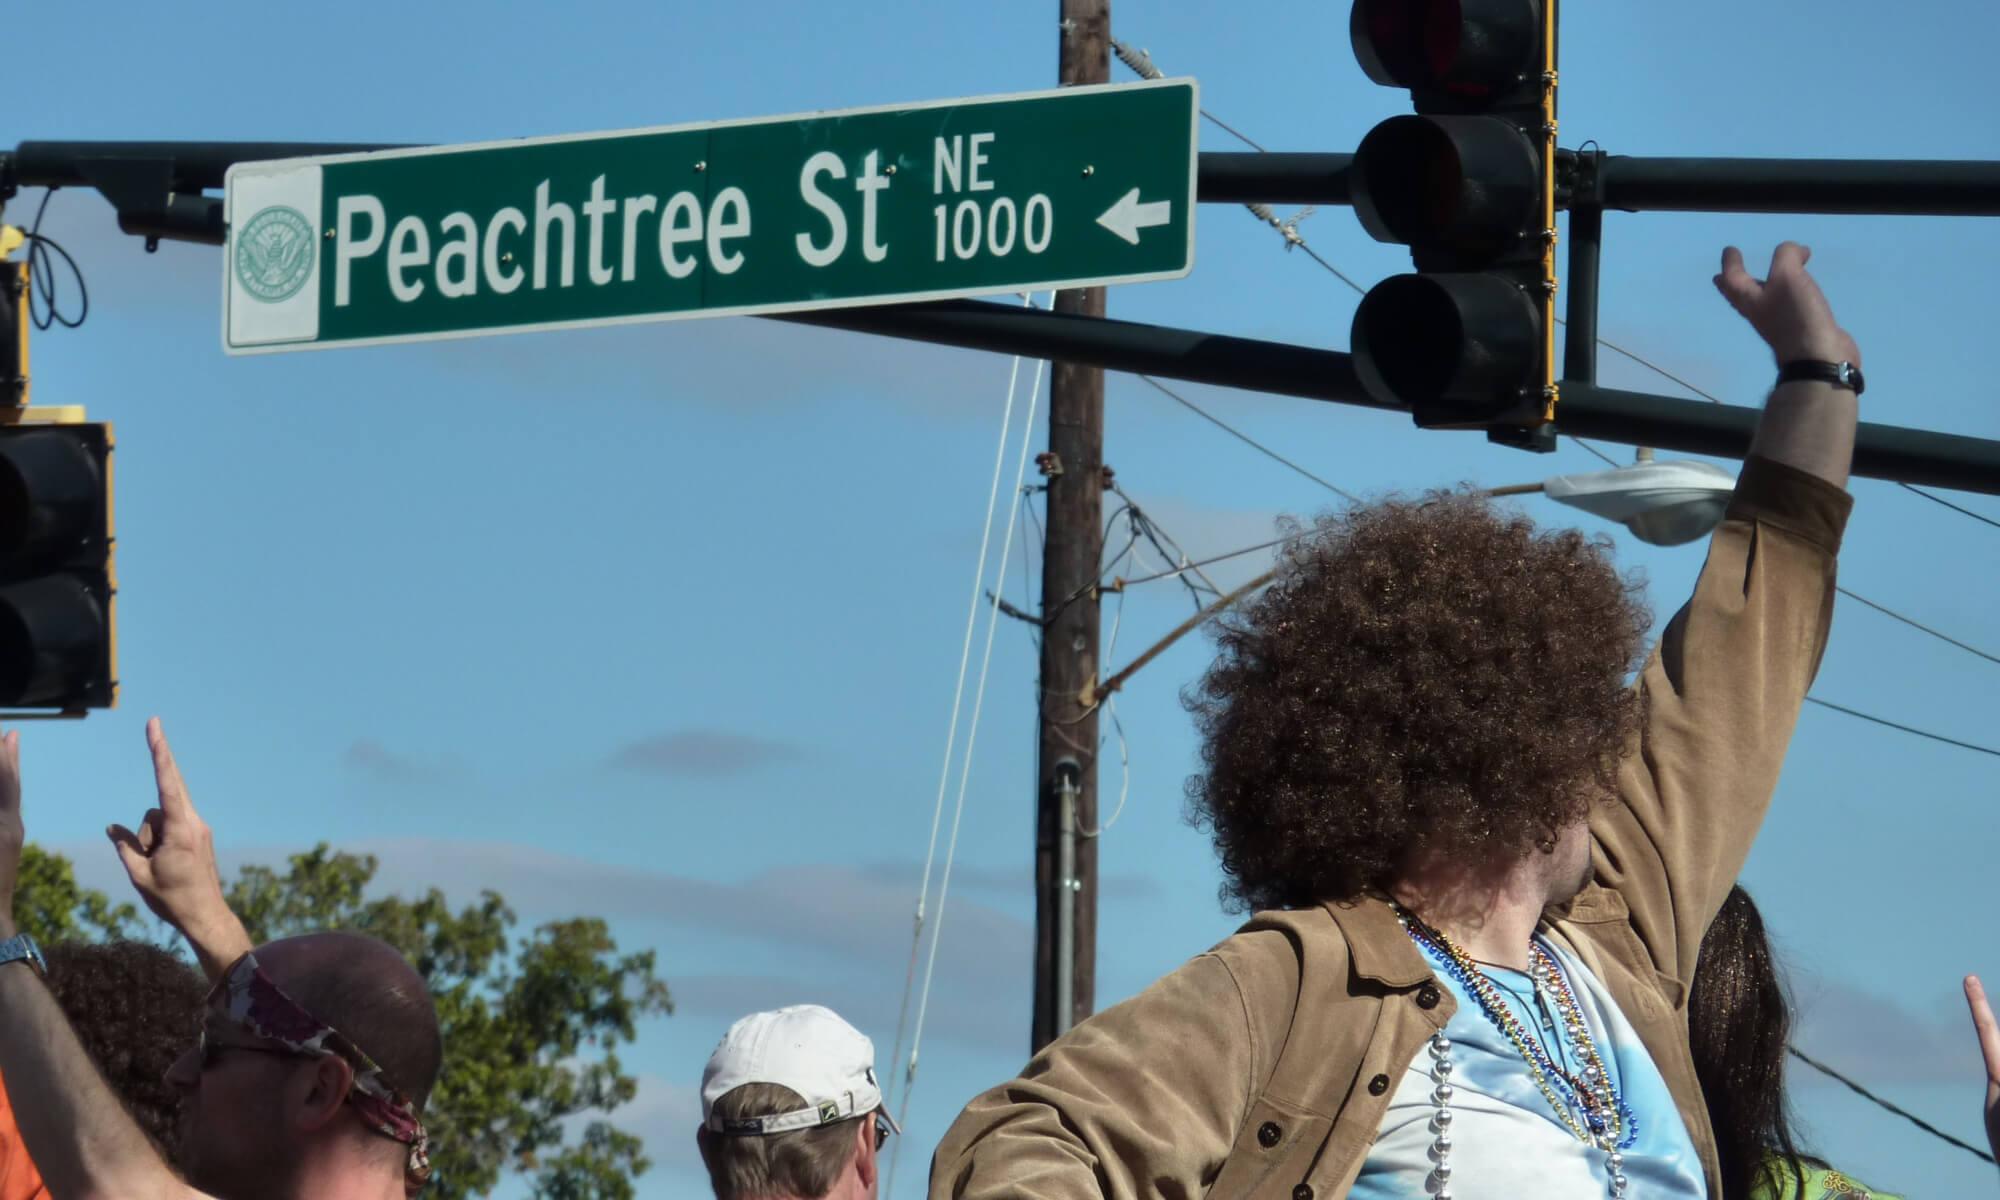 Peachtree street in Atlanta, Georgia